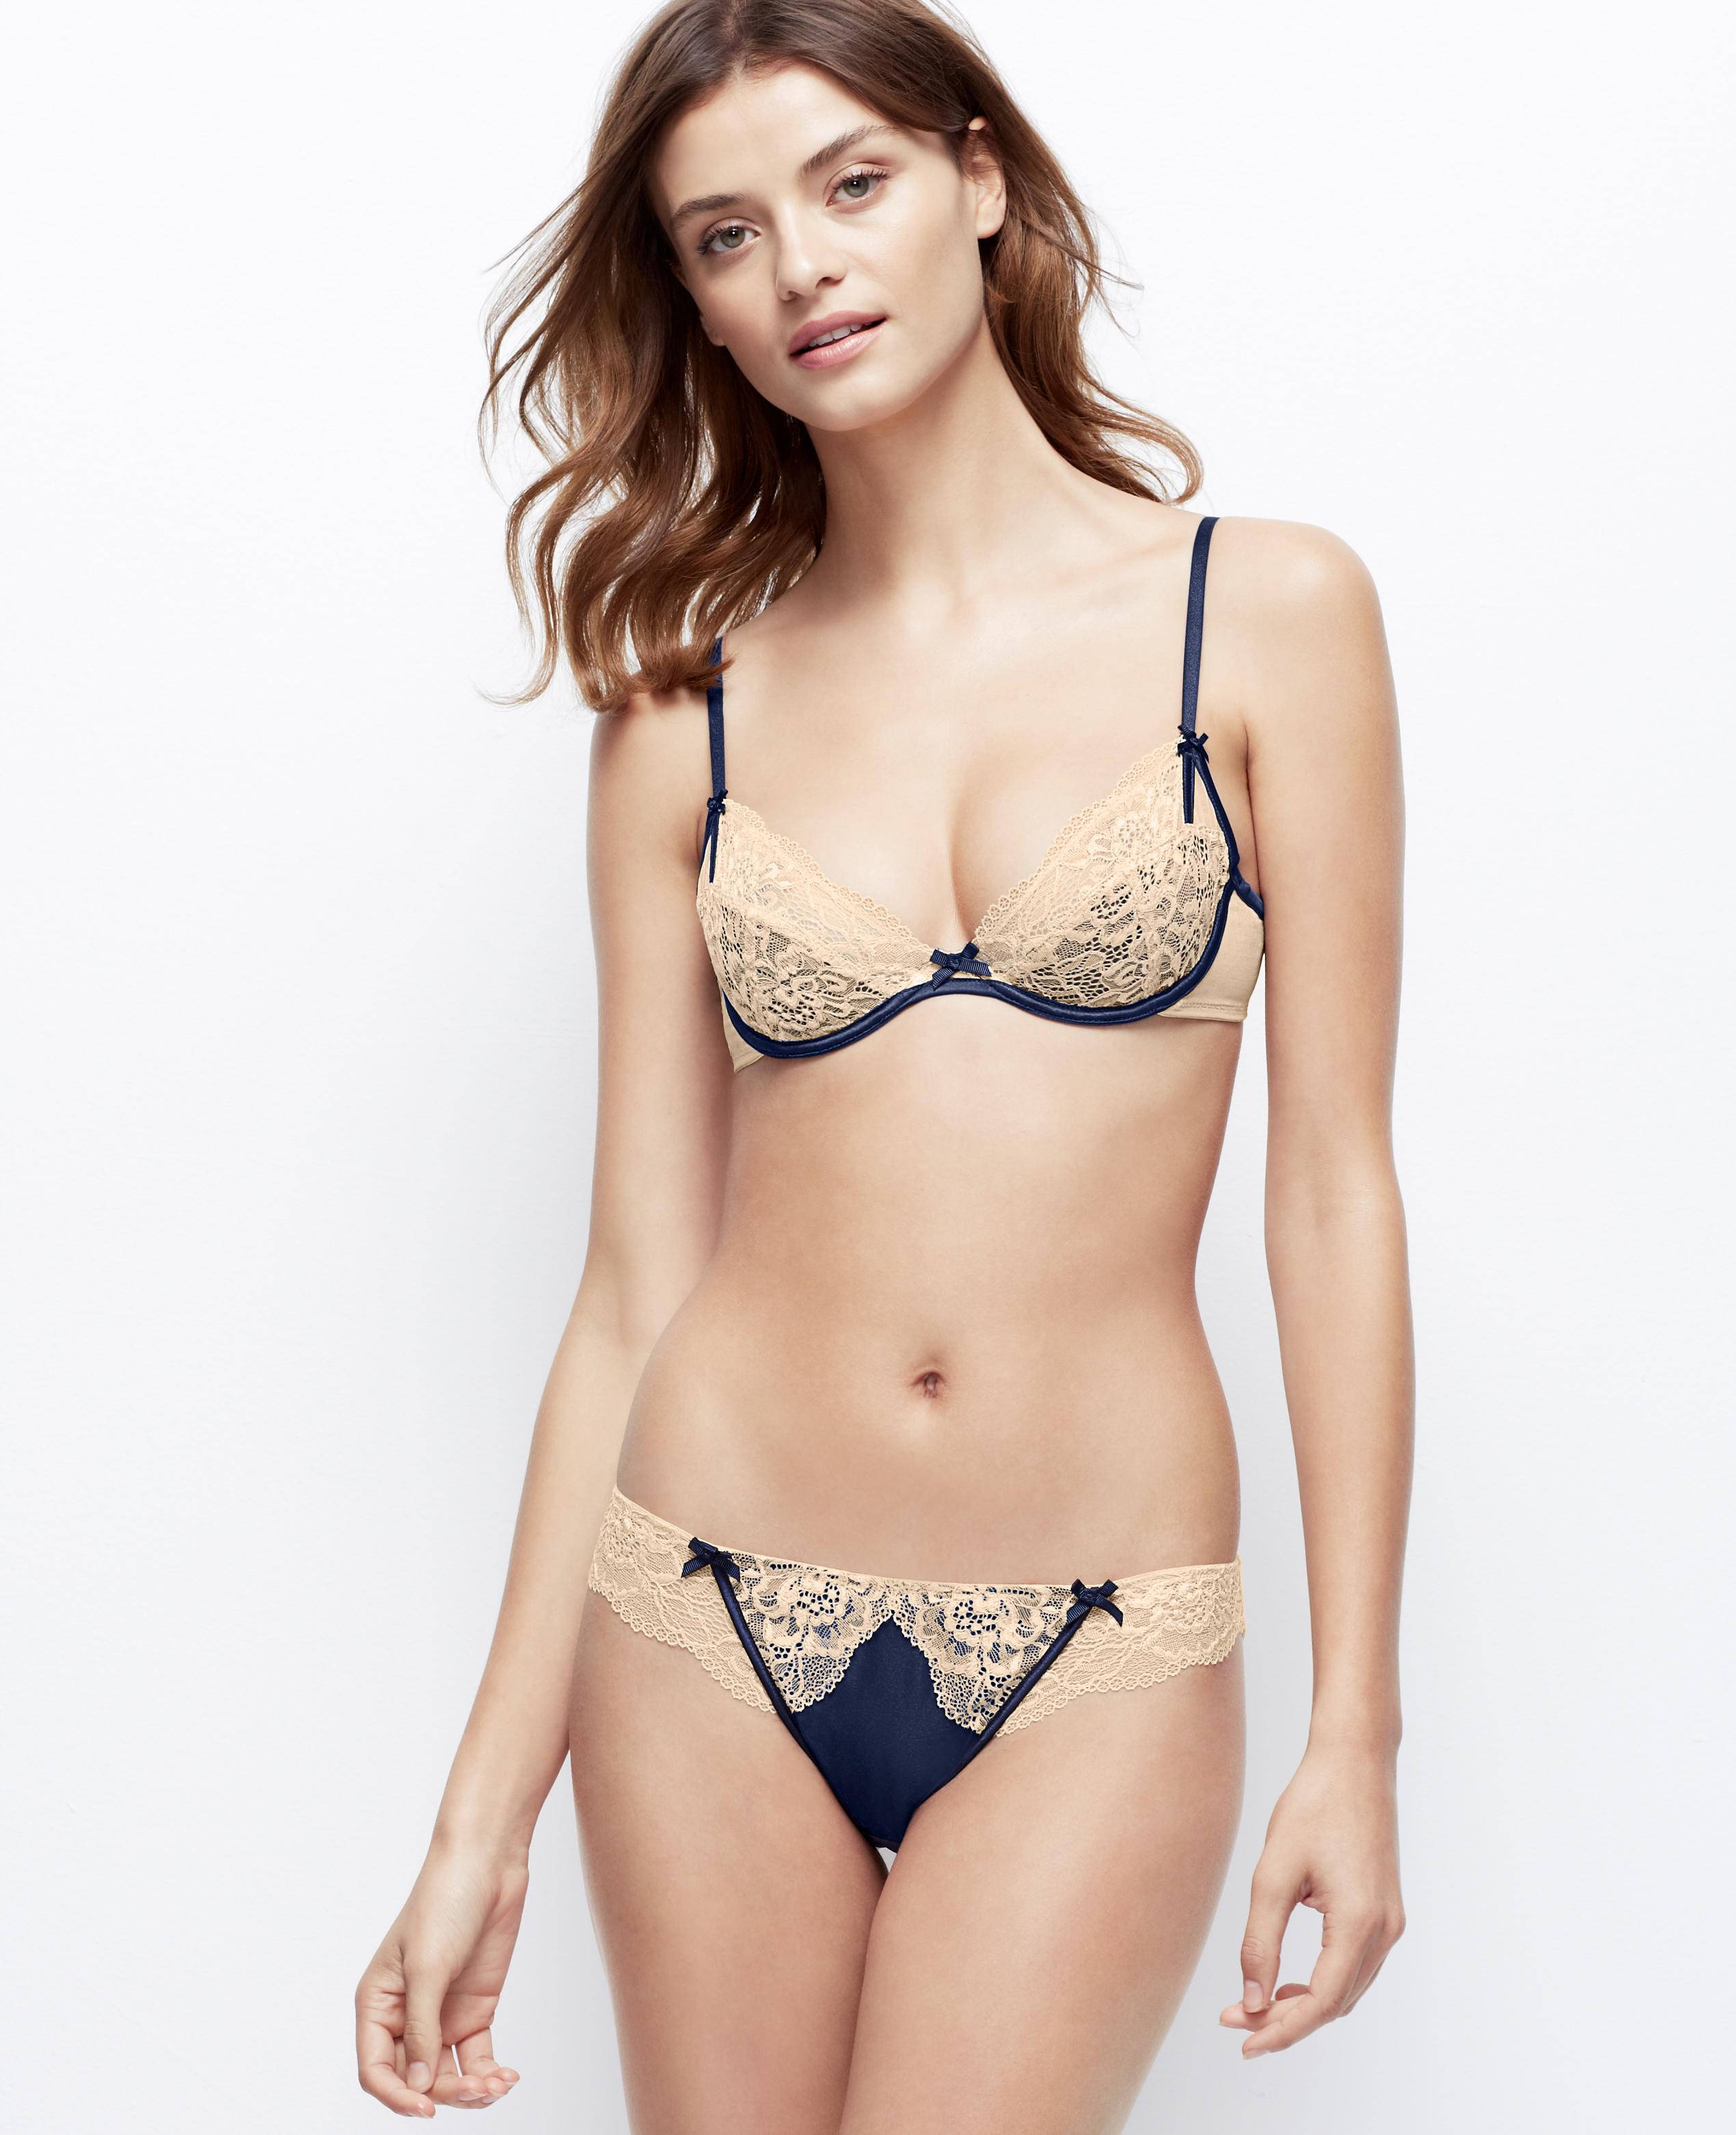 94005282d8 Lyst - Ann Taylor Elle Macpherson Intimates Balsam Moon Bikini in ...